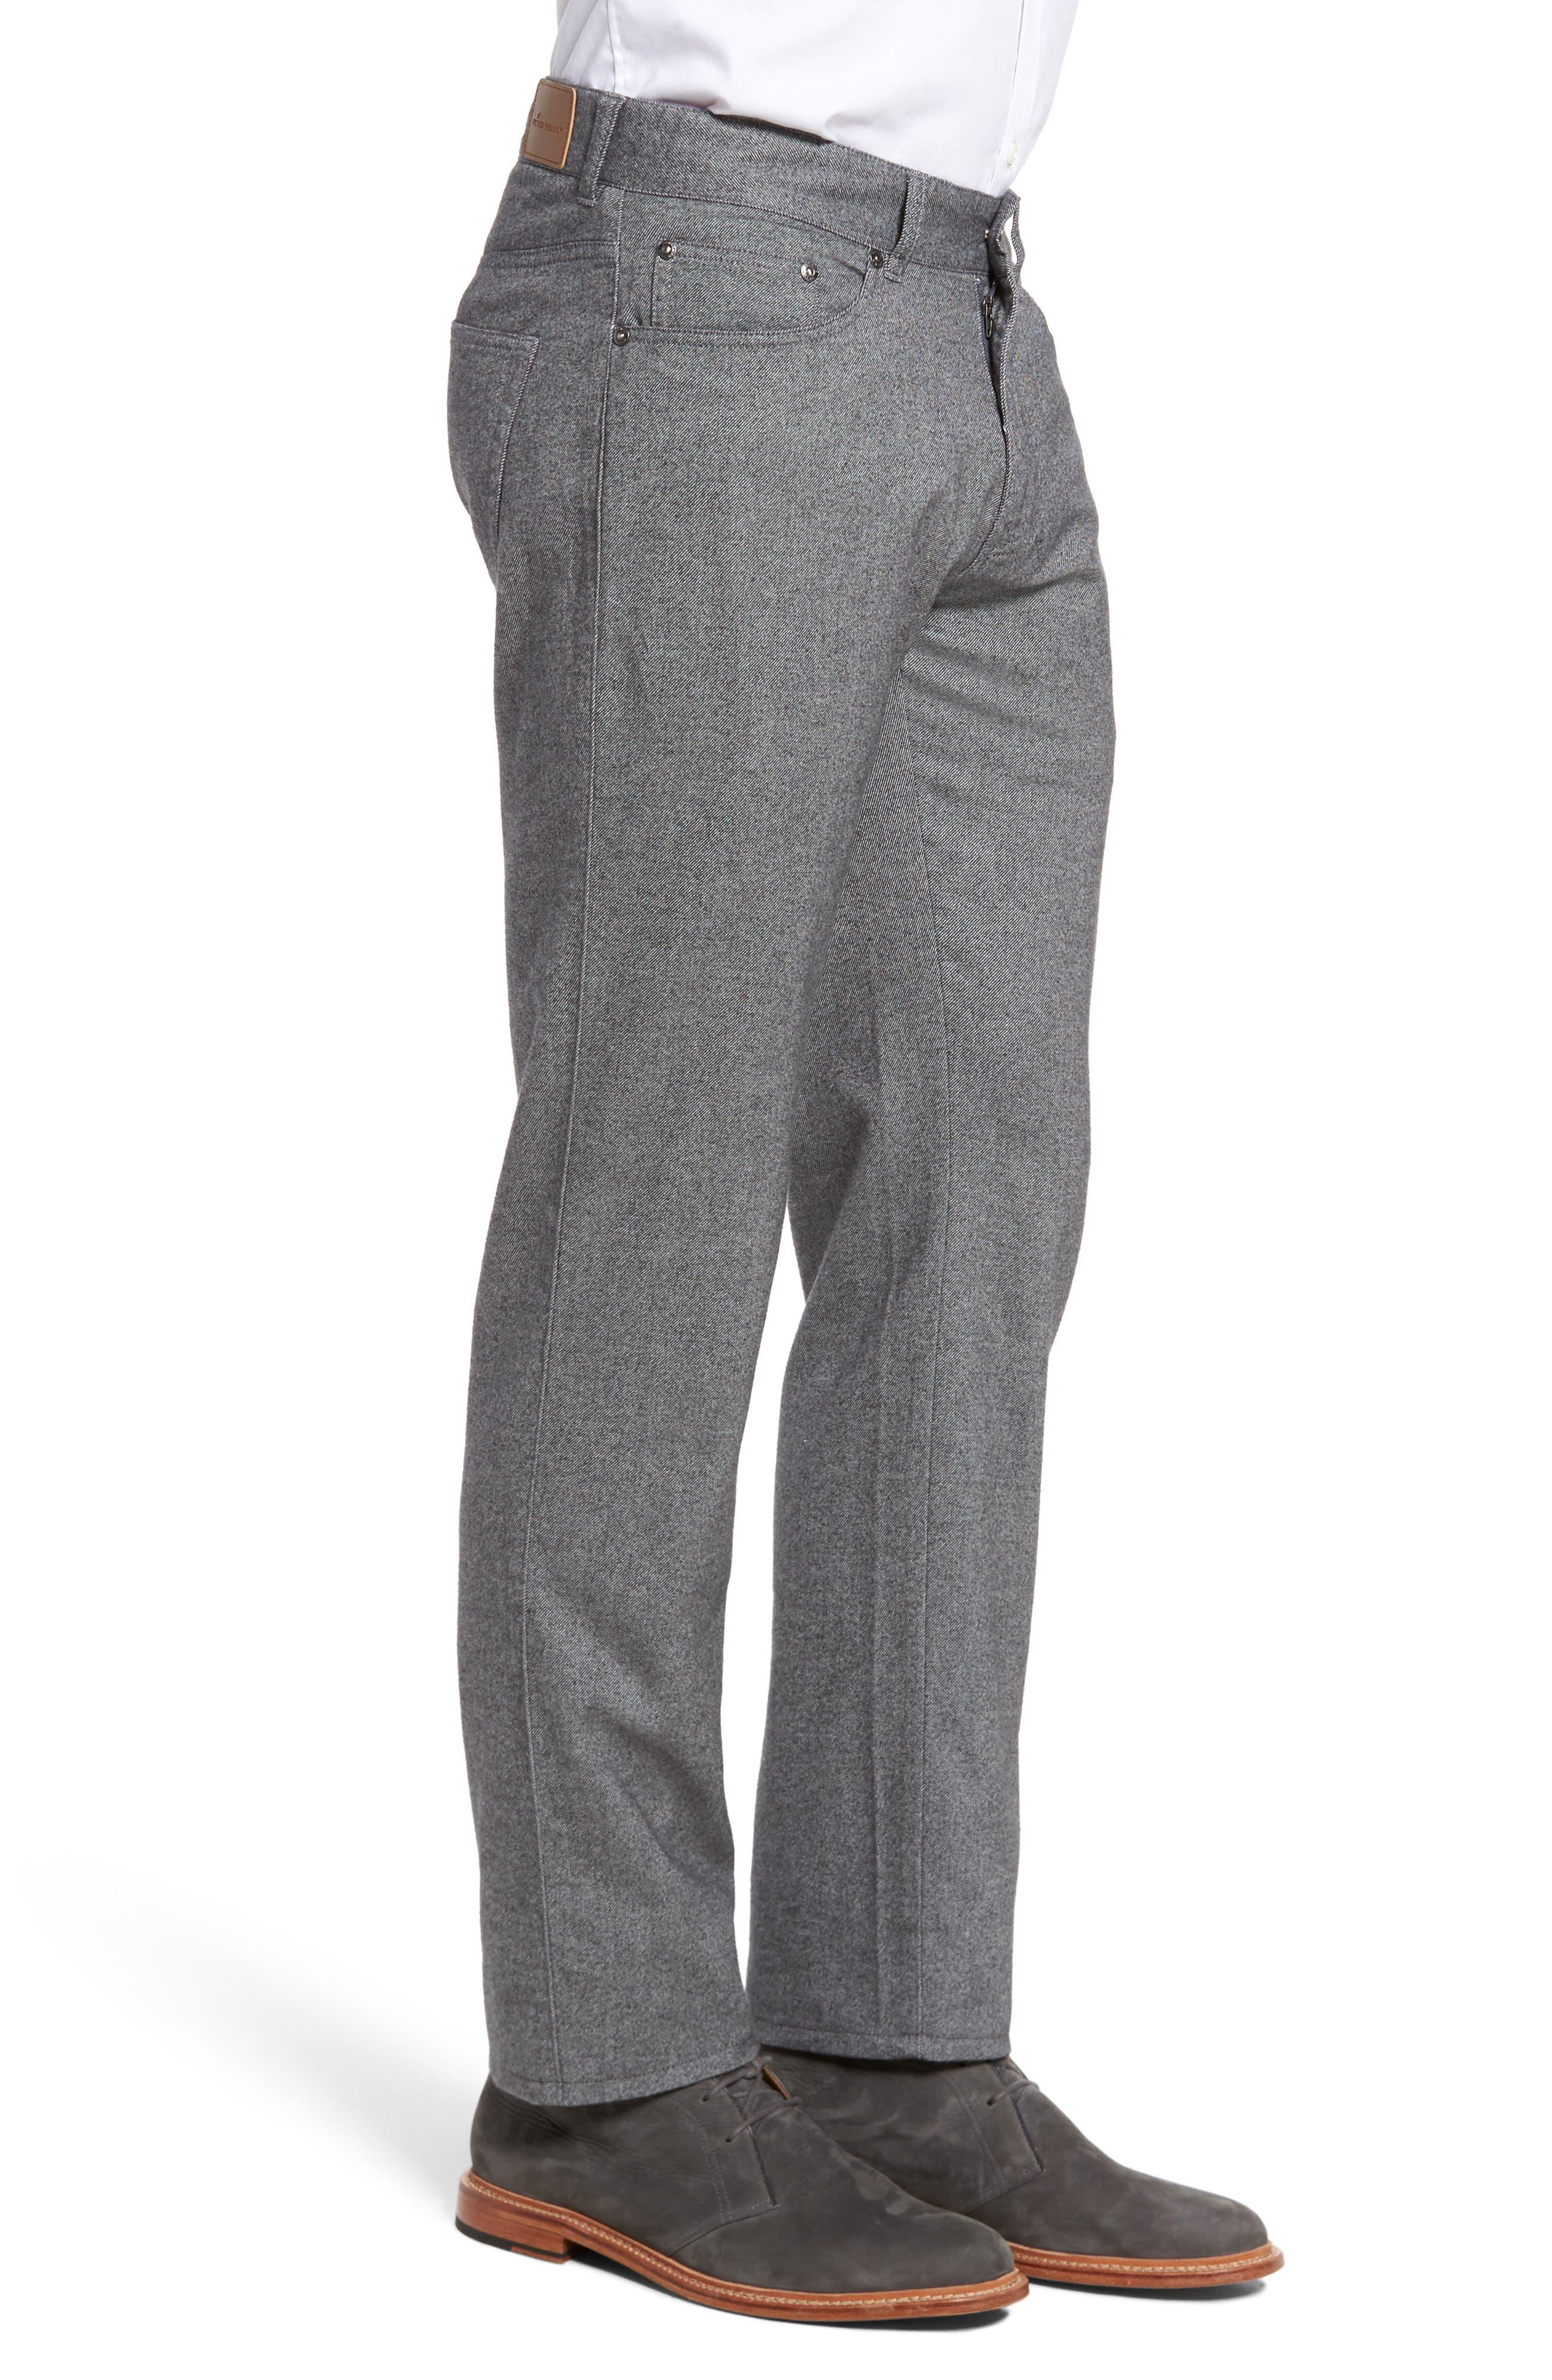 Mountainside Flannel Five-Pocket Pants,                             Alternate thumbnail 3, color,                             033